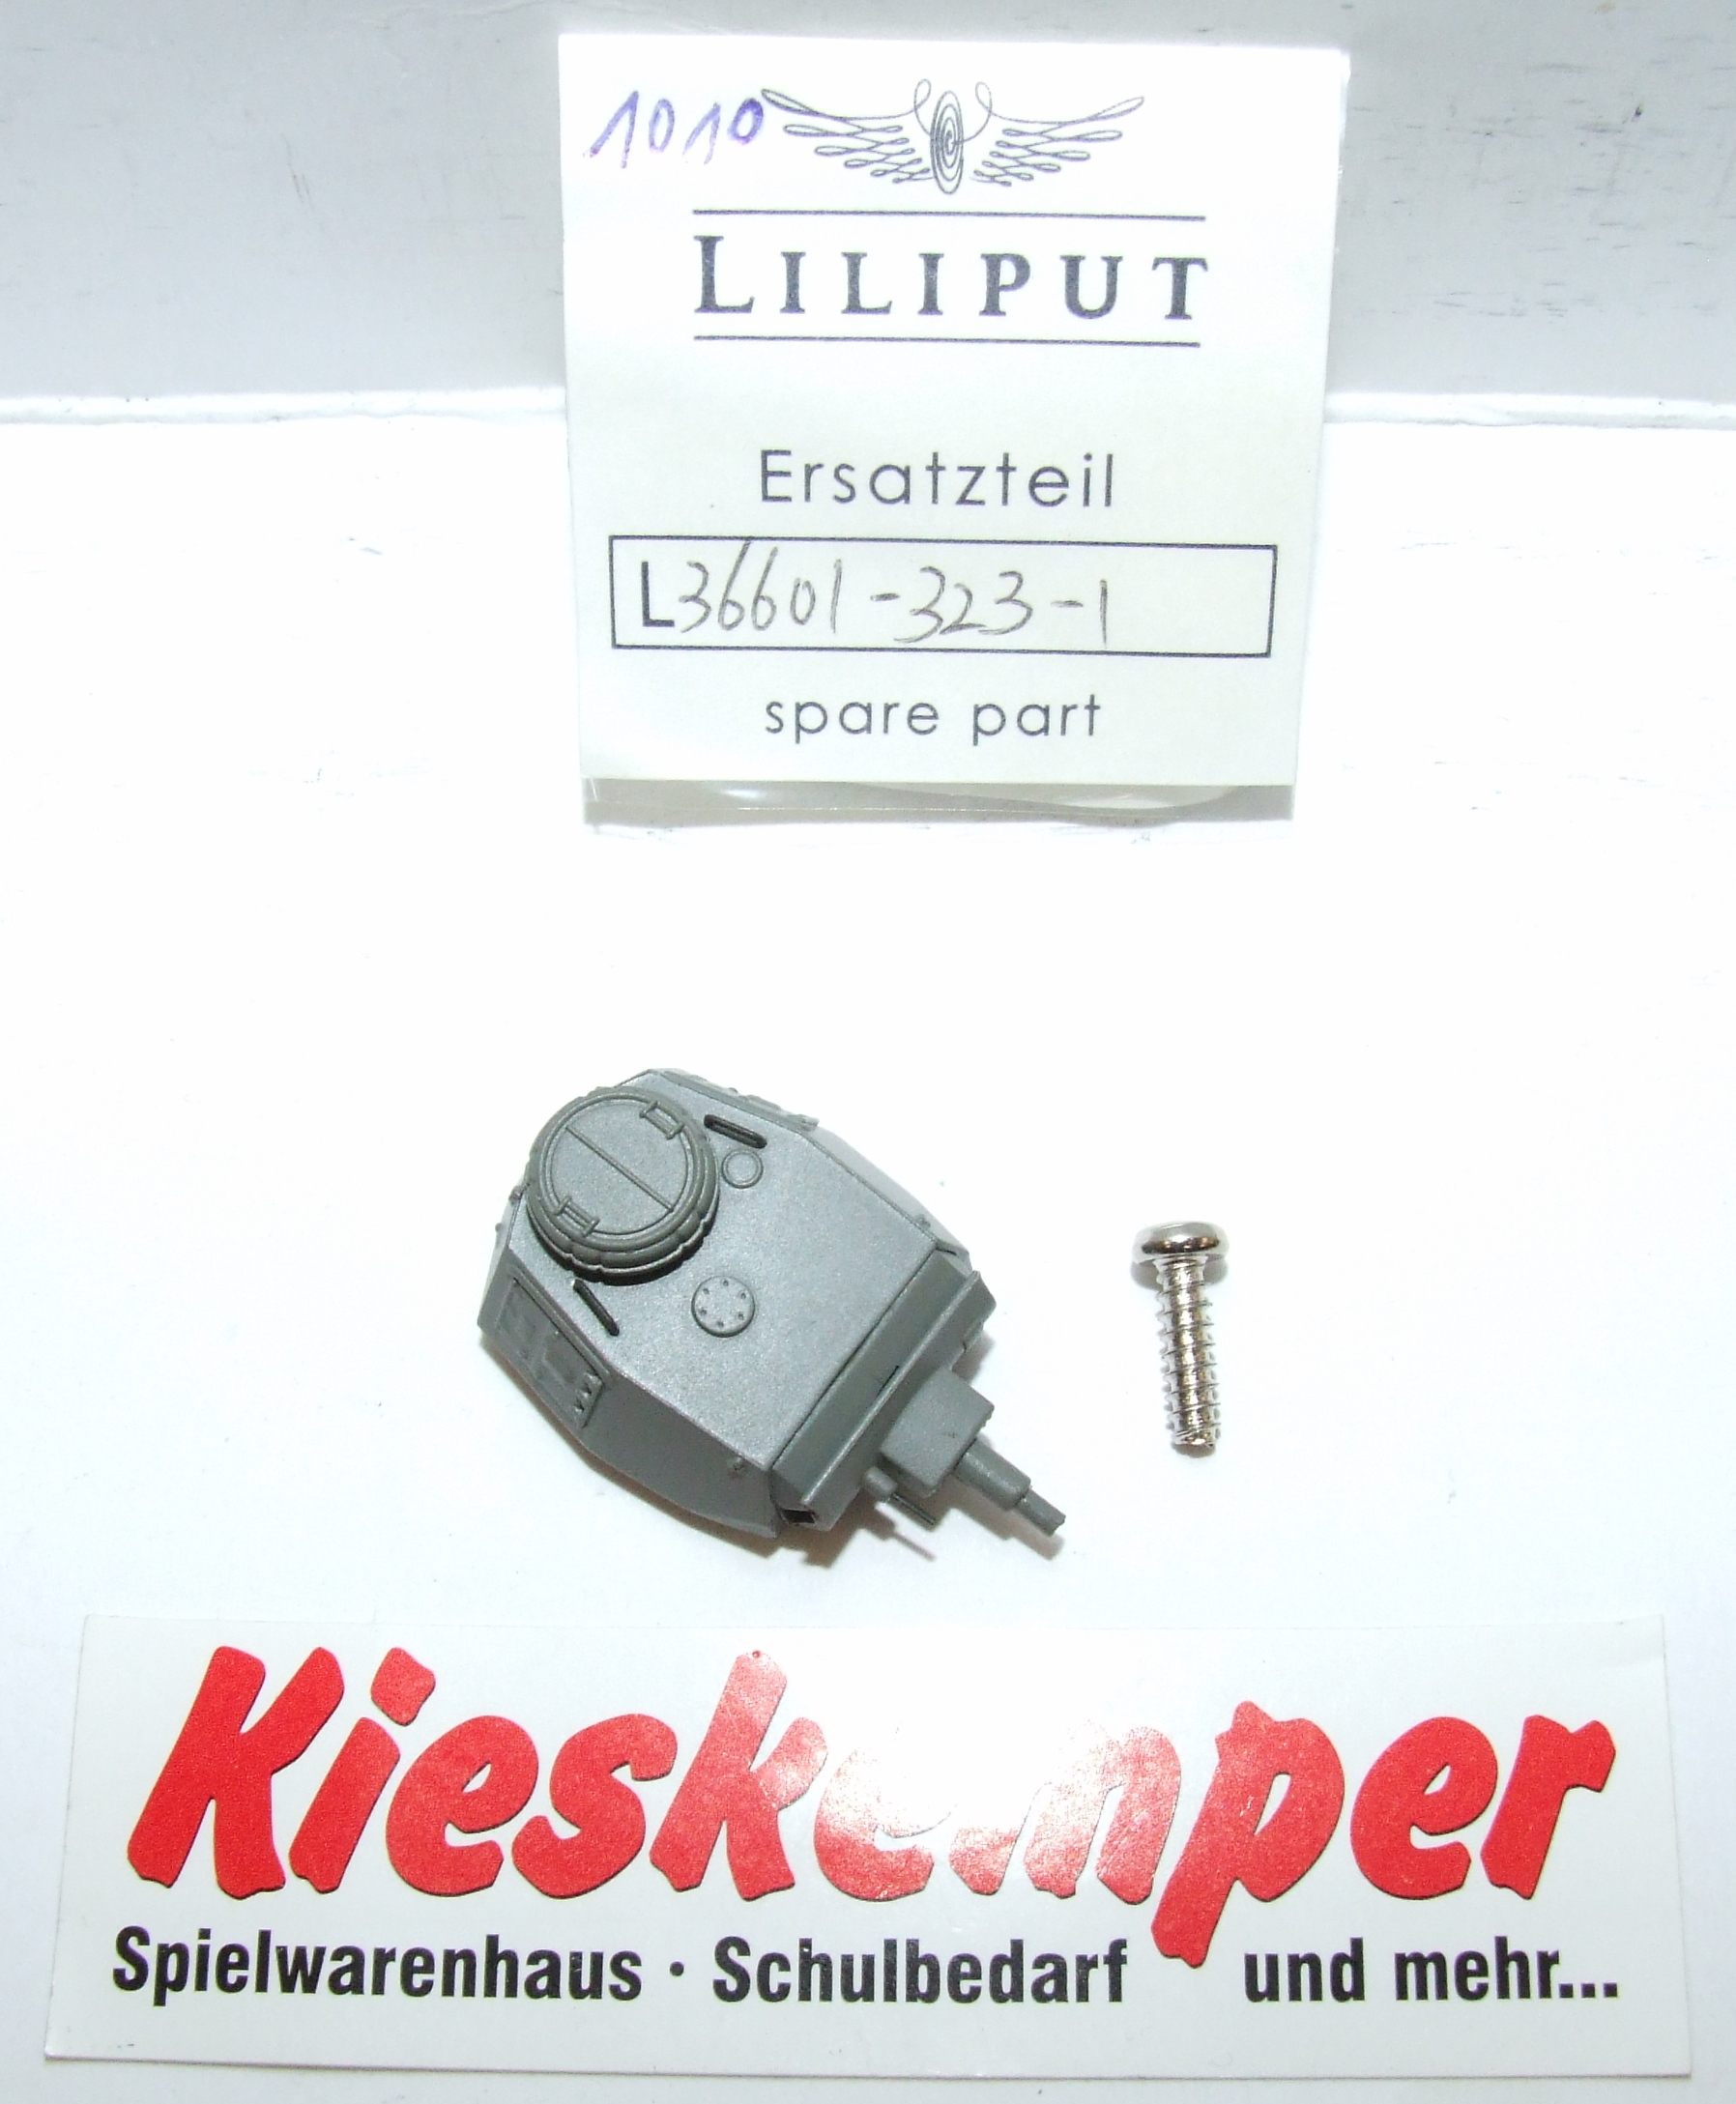 LO1010 Liliput H0 L 366013231 Geschützturm komplett grau Ersatzteil für Panzer Zug Wehrmacht